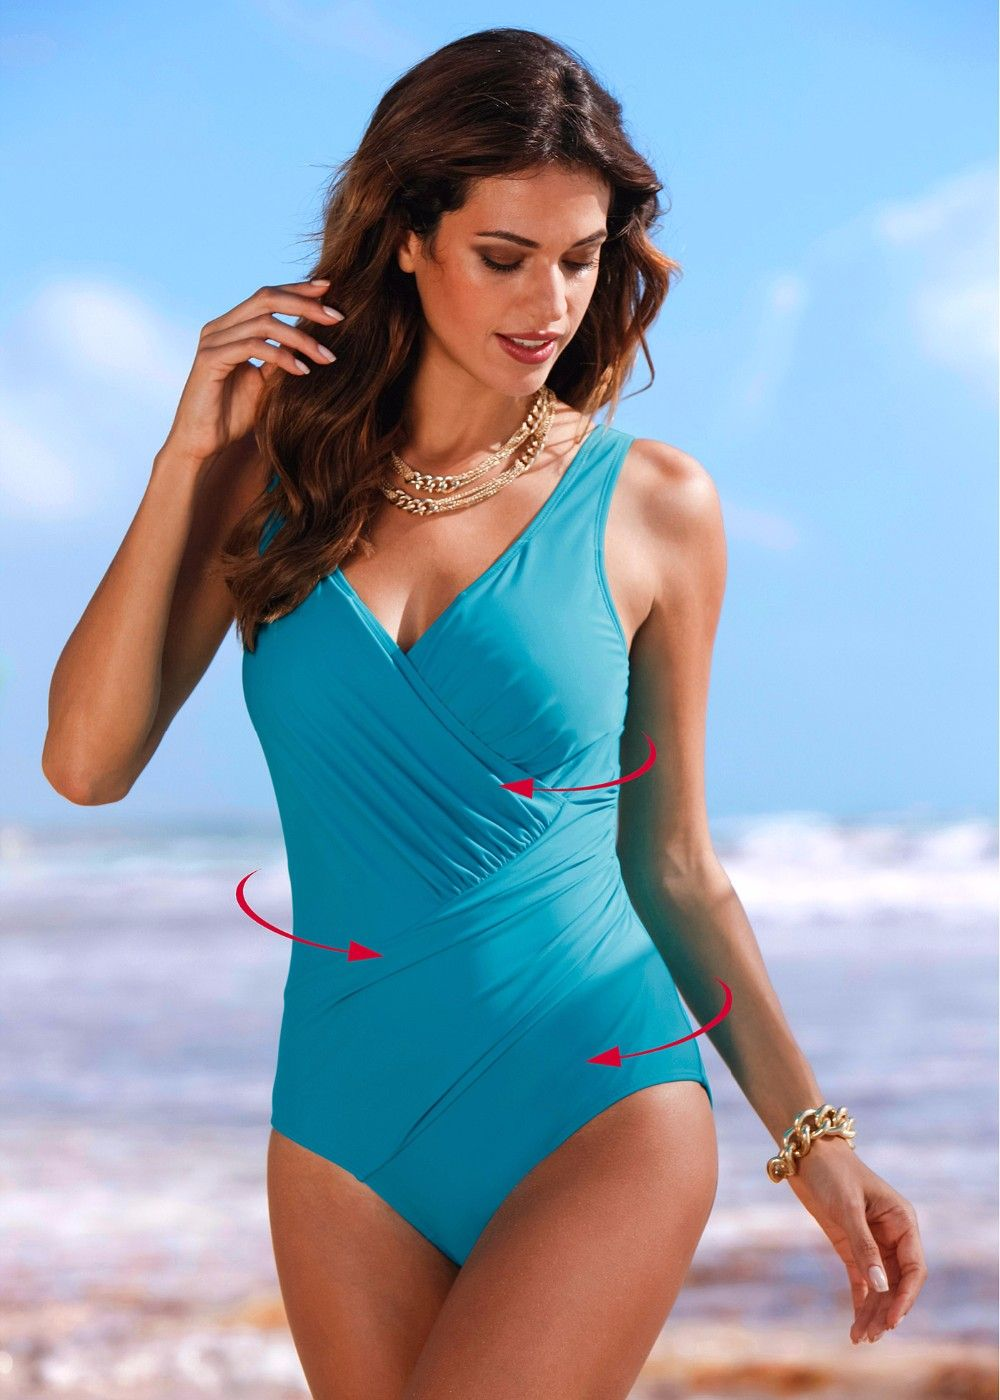 f46df89d685  29.37 - Nice NAKIAEOI 2017 New One Piece Swimsuit Women Plus Size Swimwear  Retro Vintage Bathing Suits Beachwear Print Swim Wear Monokini 4XL - Buy it  Now!